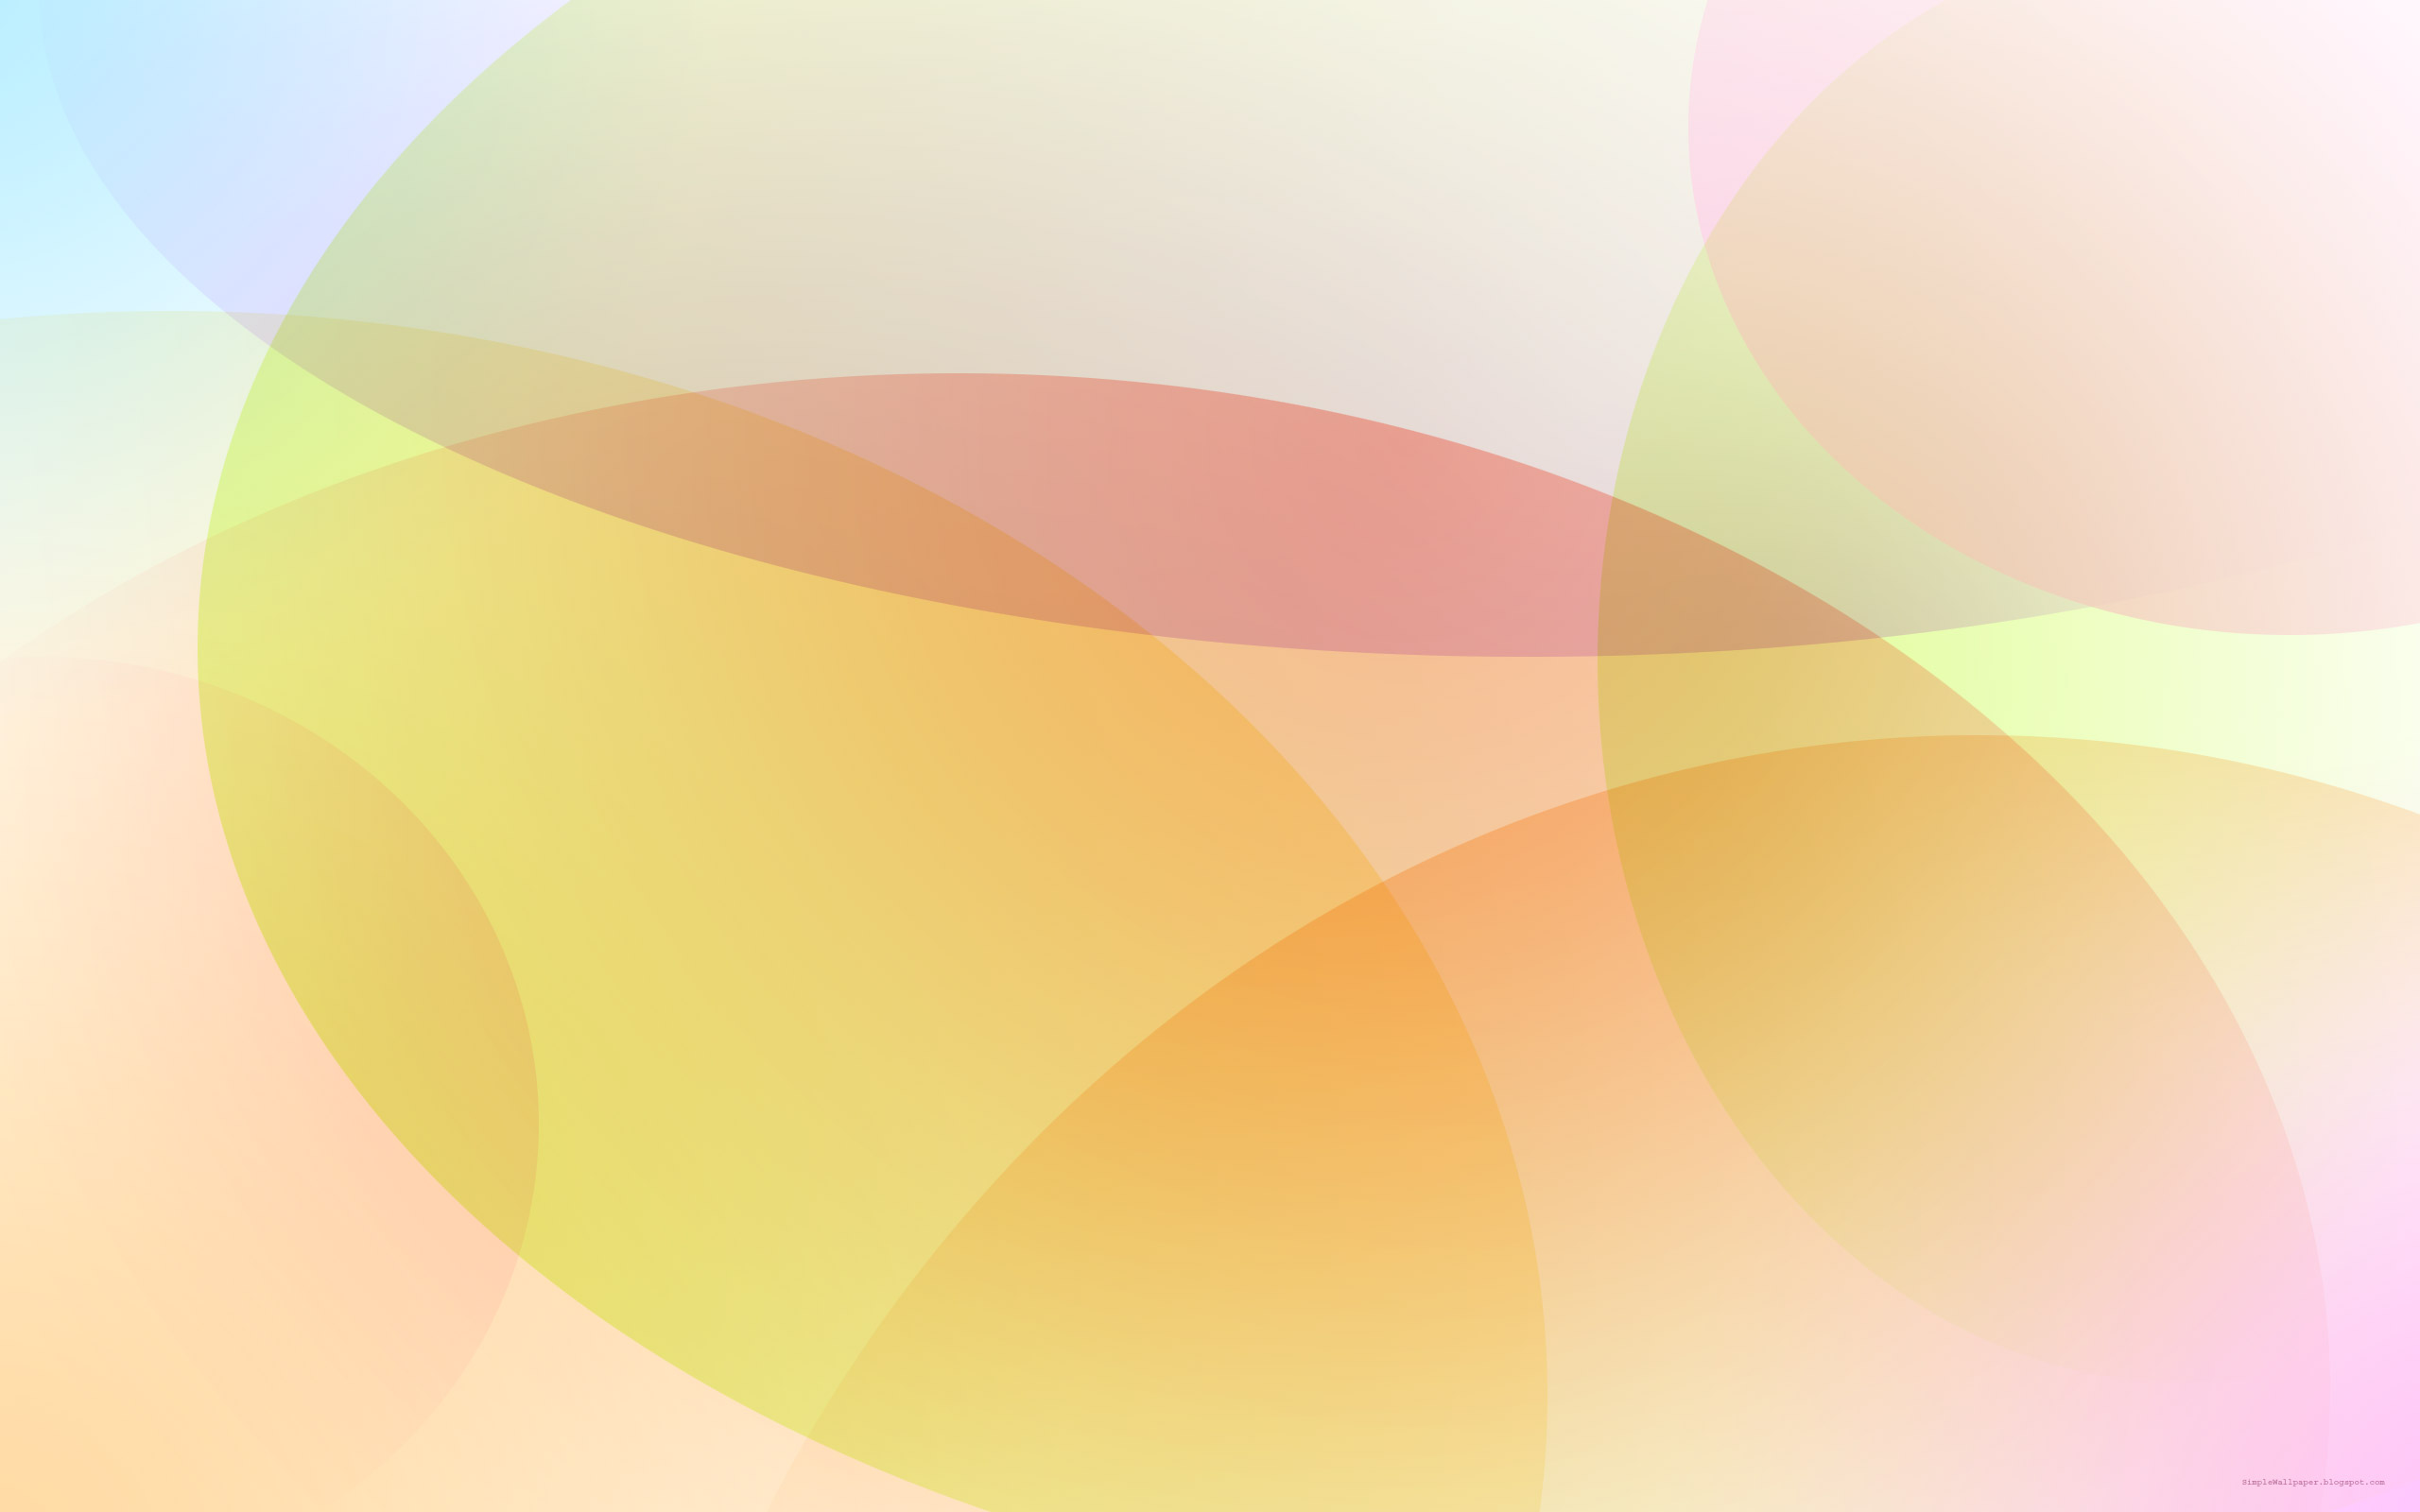 Pastel Rainbow Wallpaper   HD Wallpapers 2560x1600